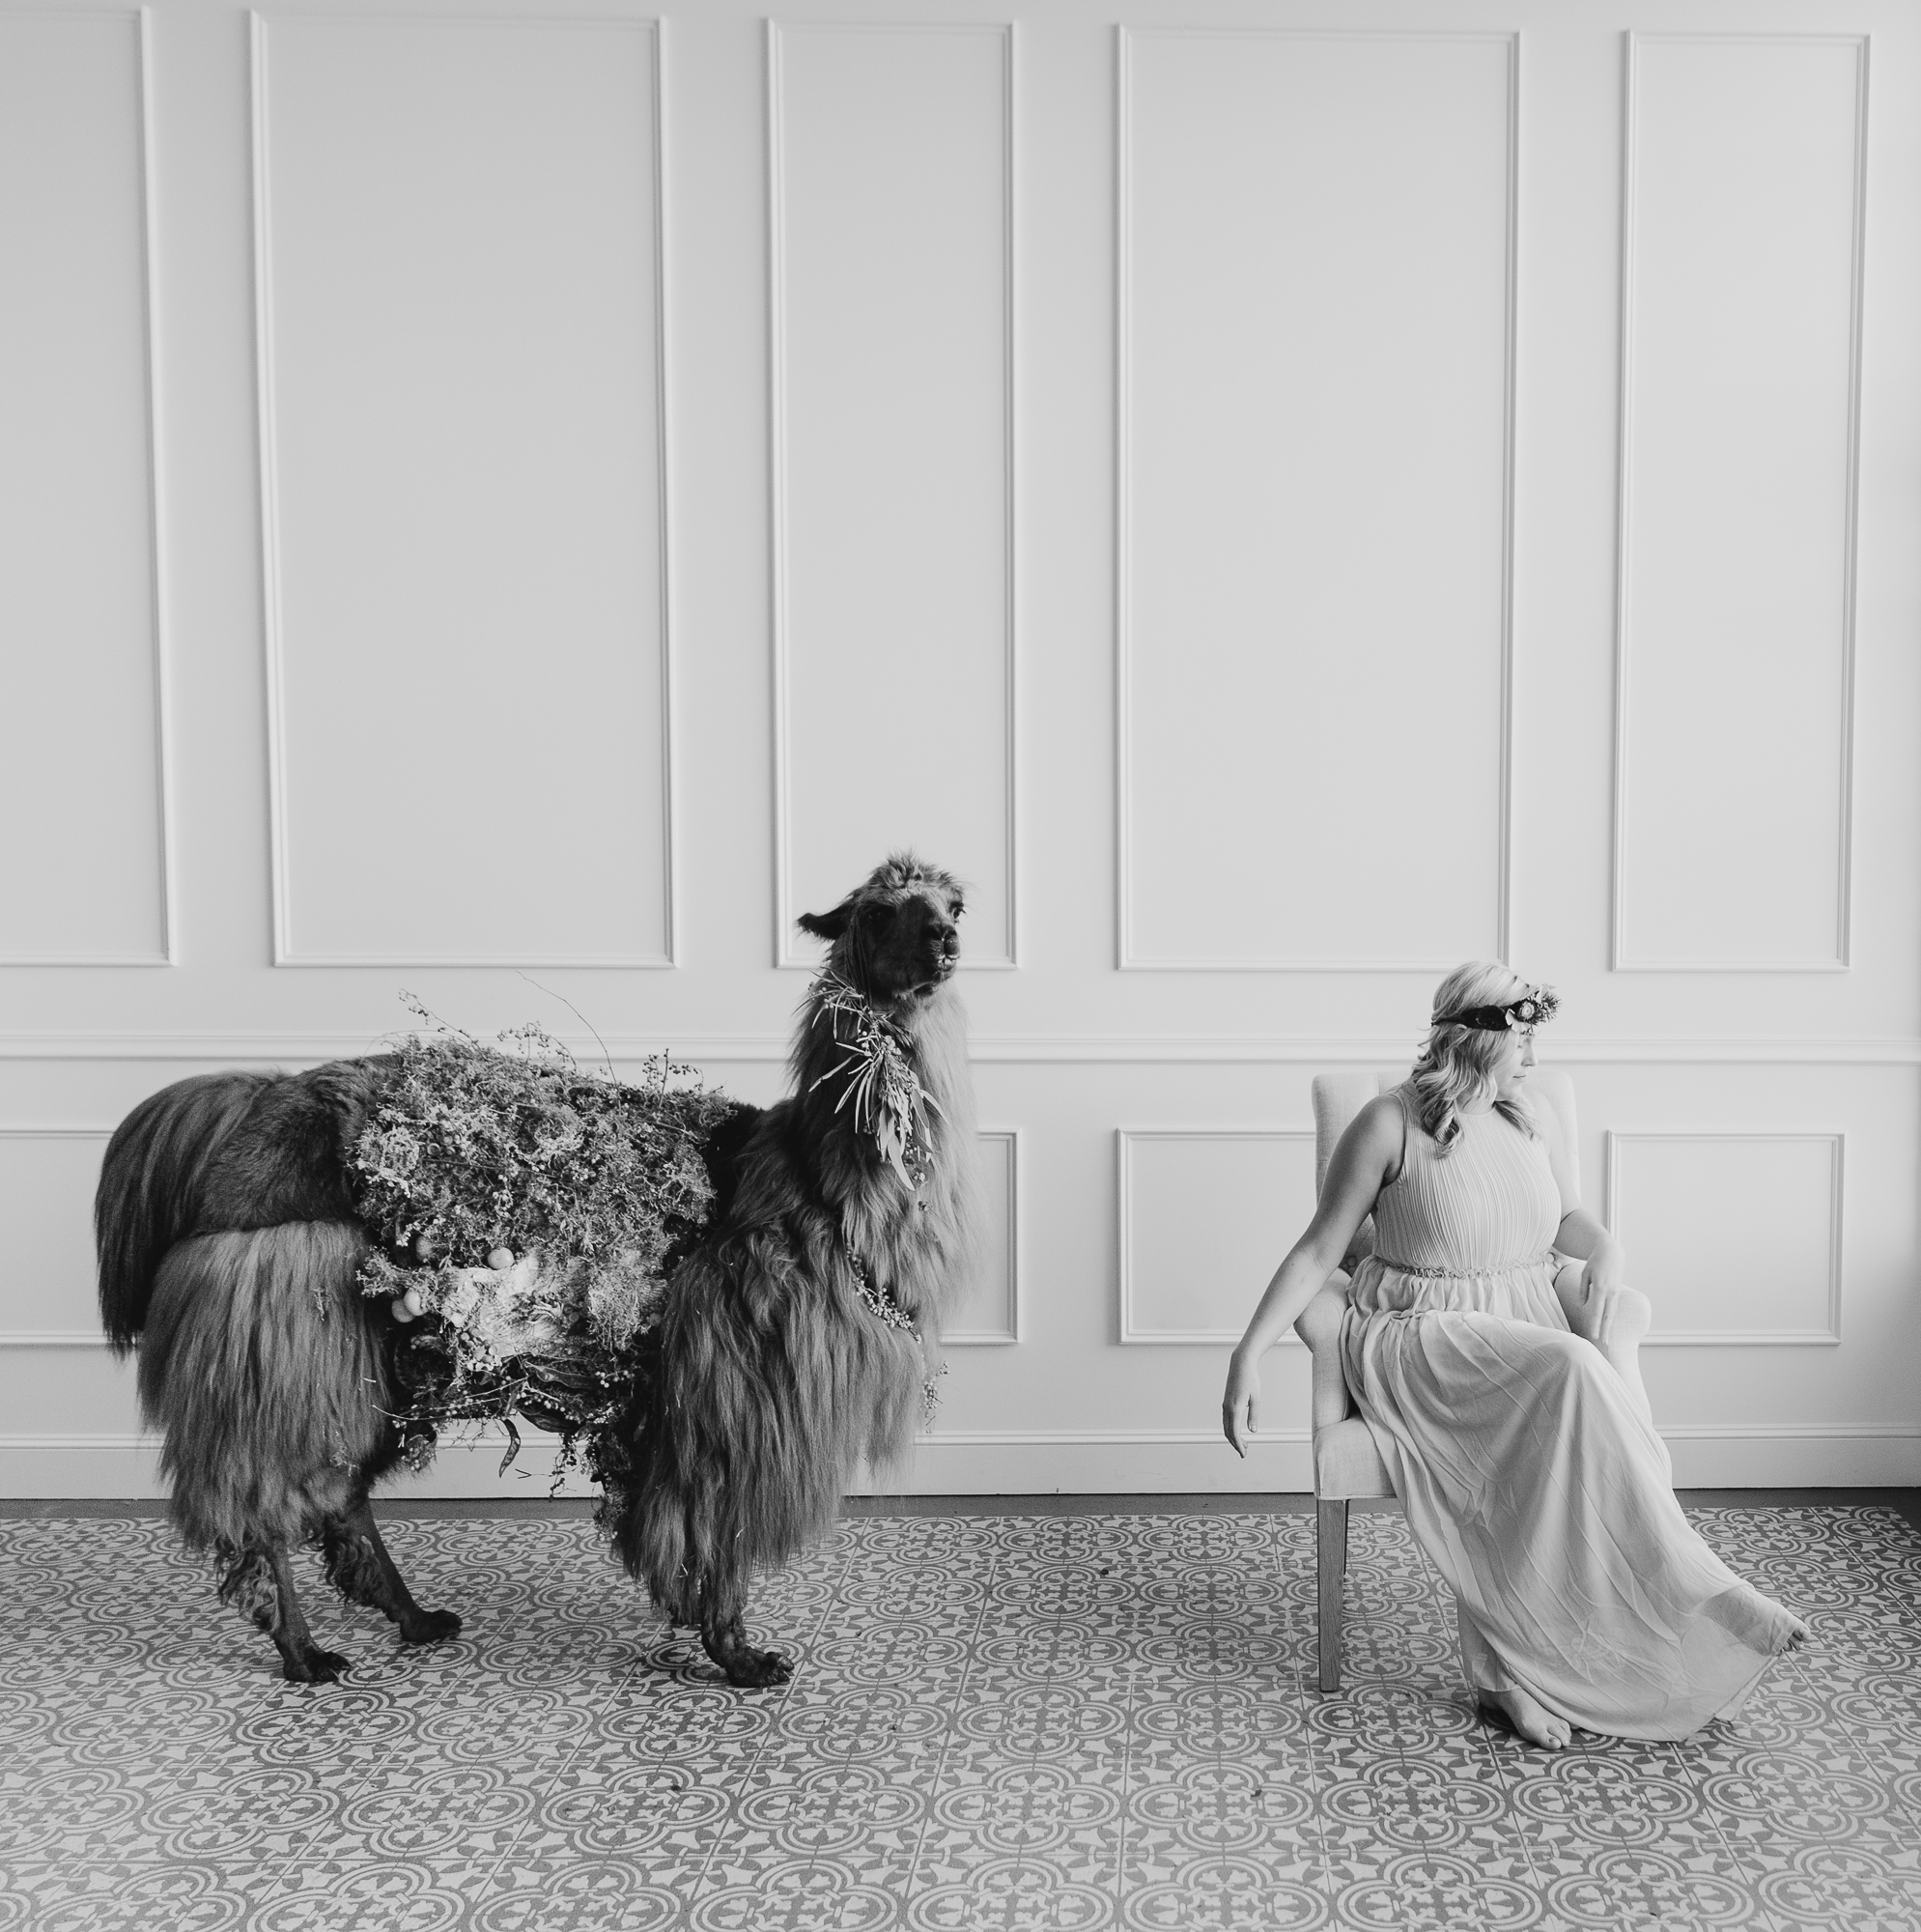 llama_portland_animal-19.JPG